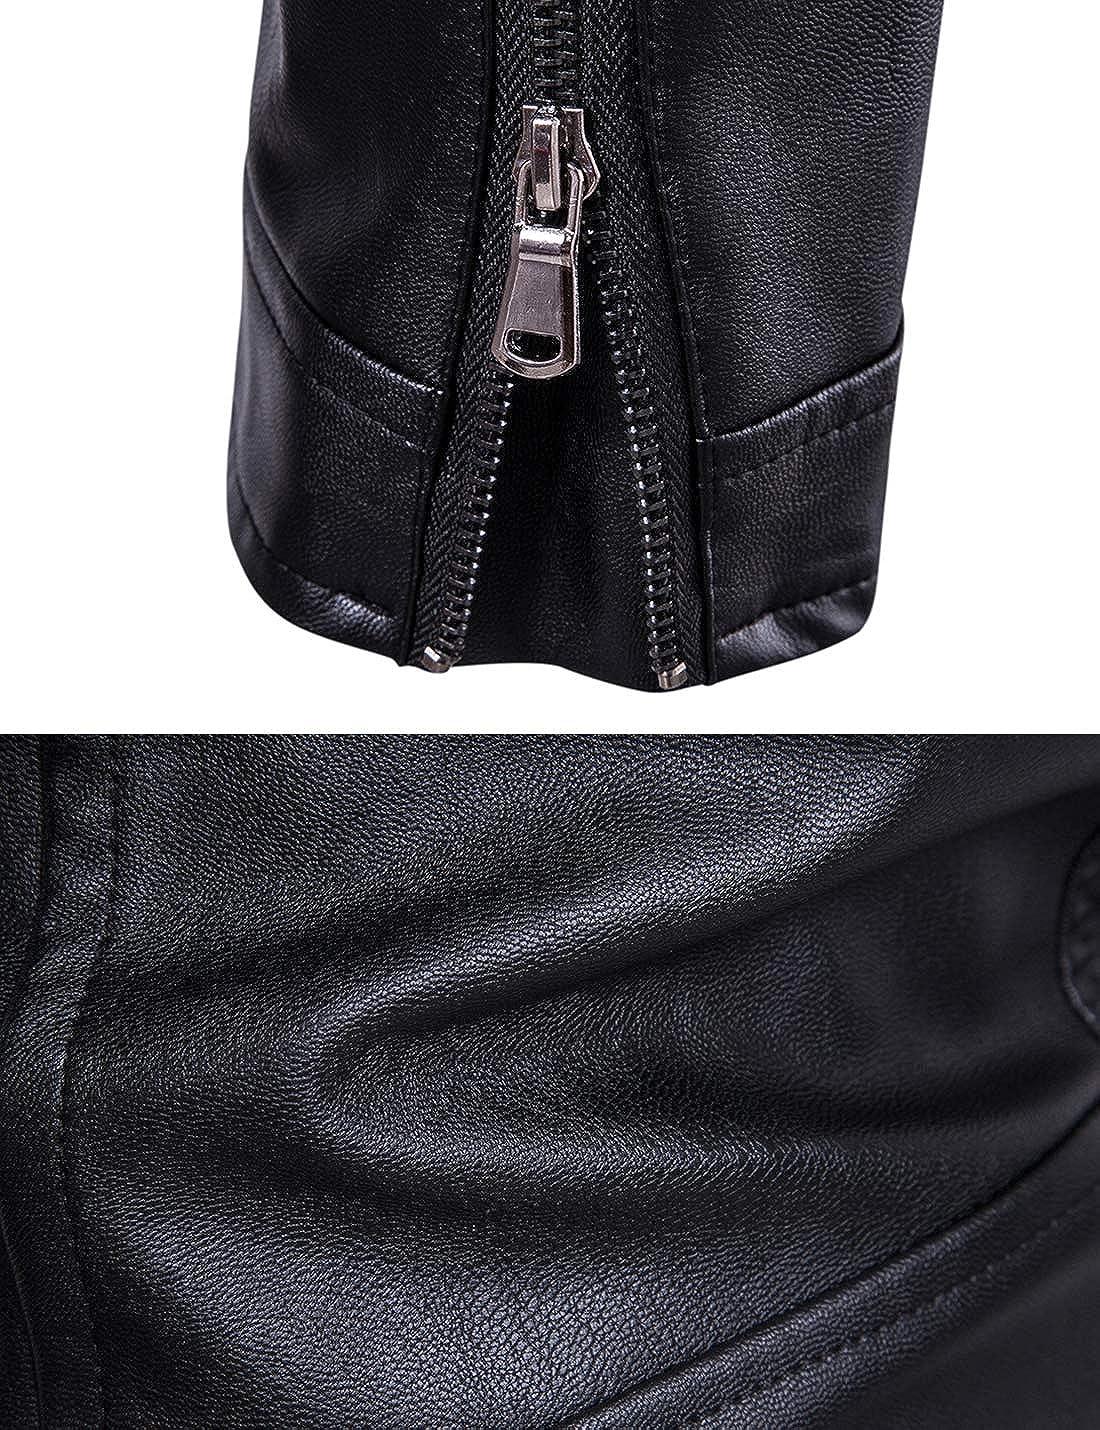 Tanming Mens Slim Stand Collar Slant Zipper Lace Up Outerwear Moto Biker Jacket Coats